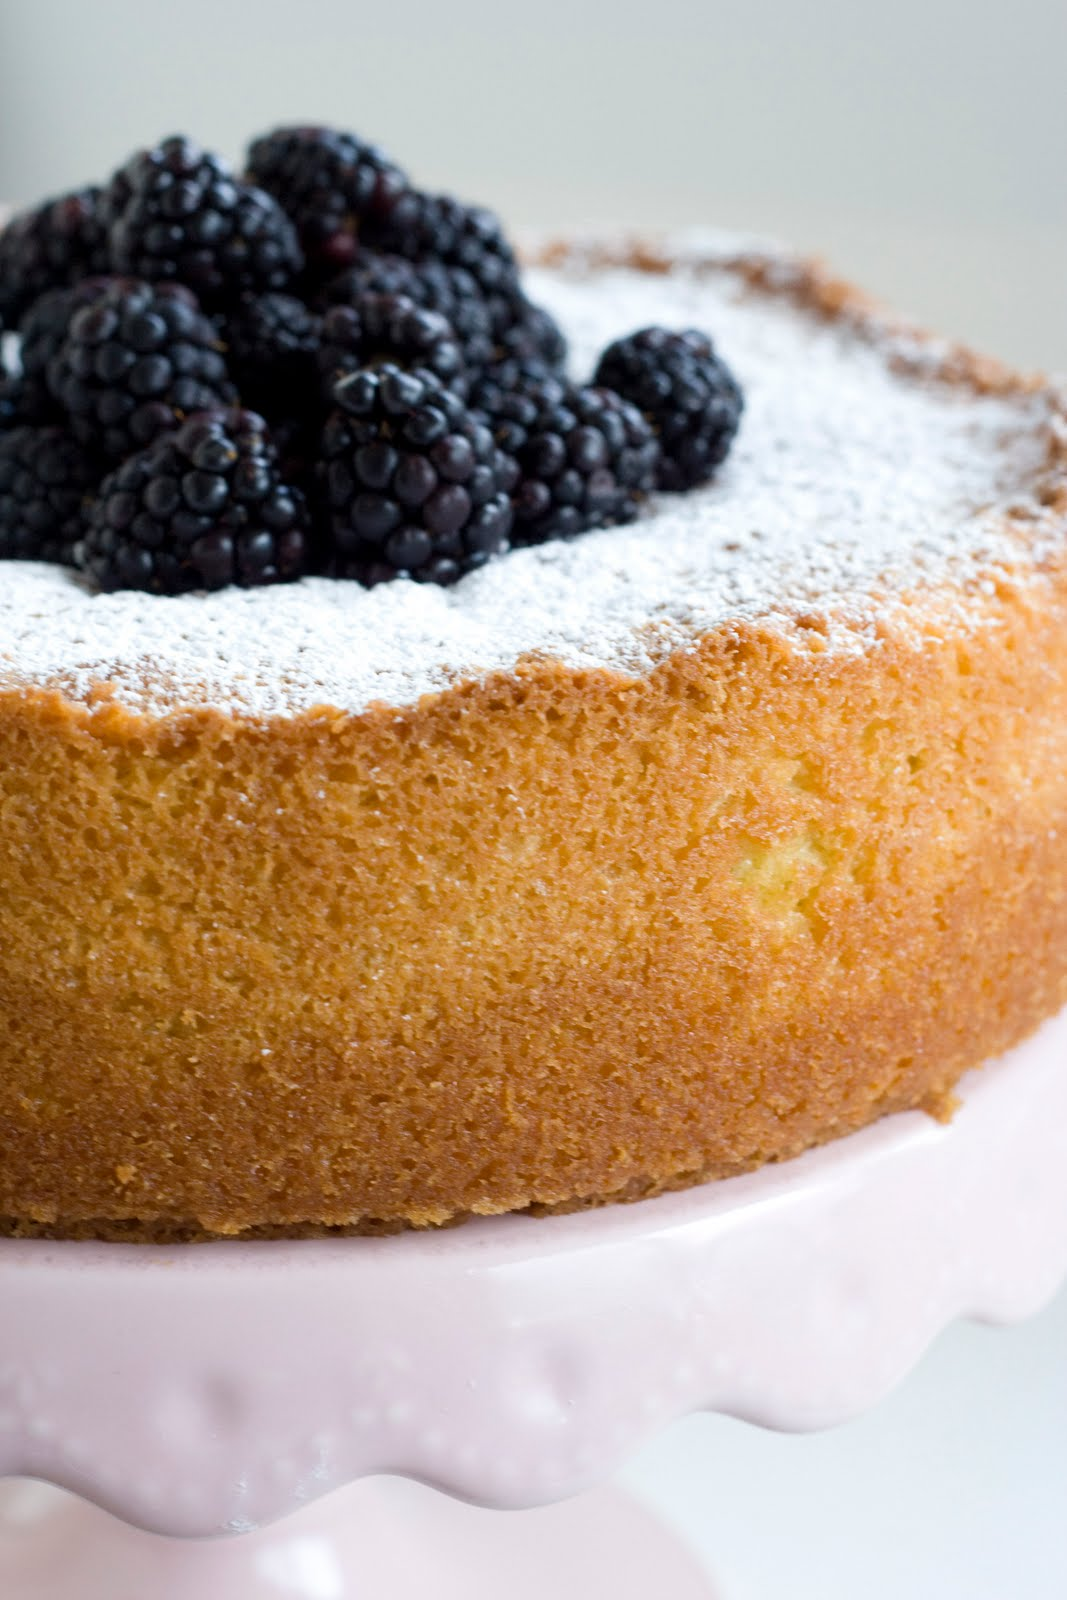 Almond Torte | Vintage Mixer